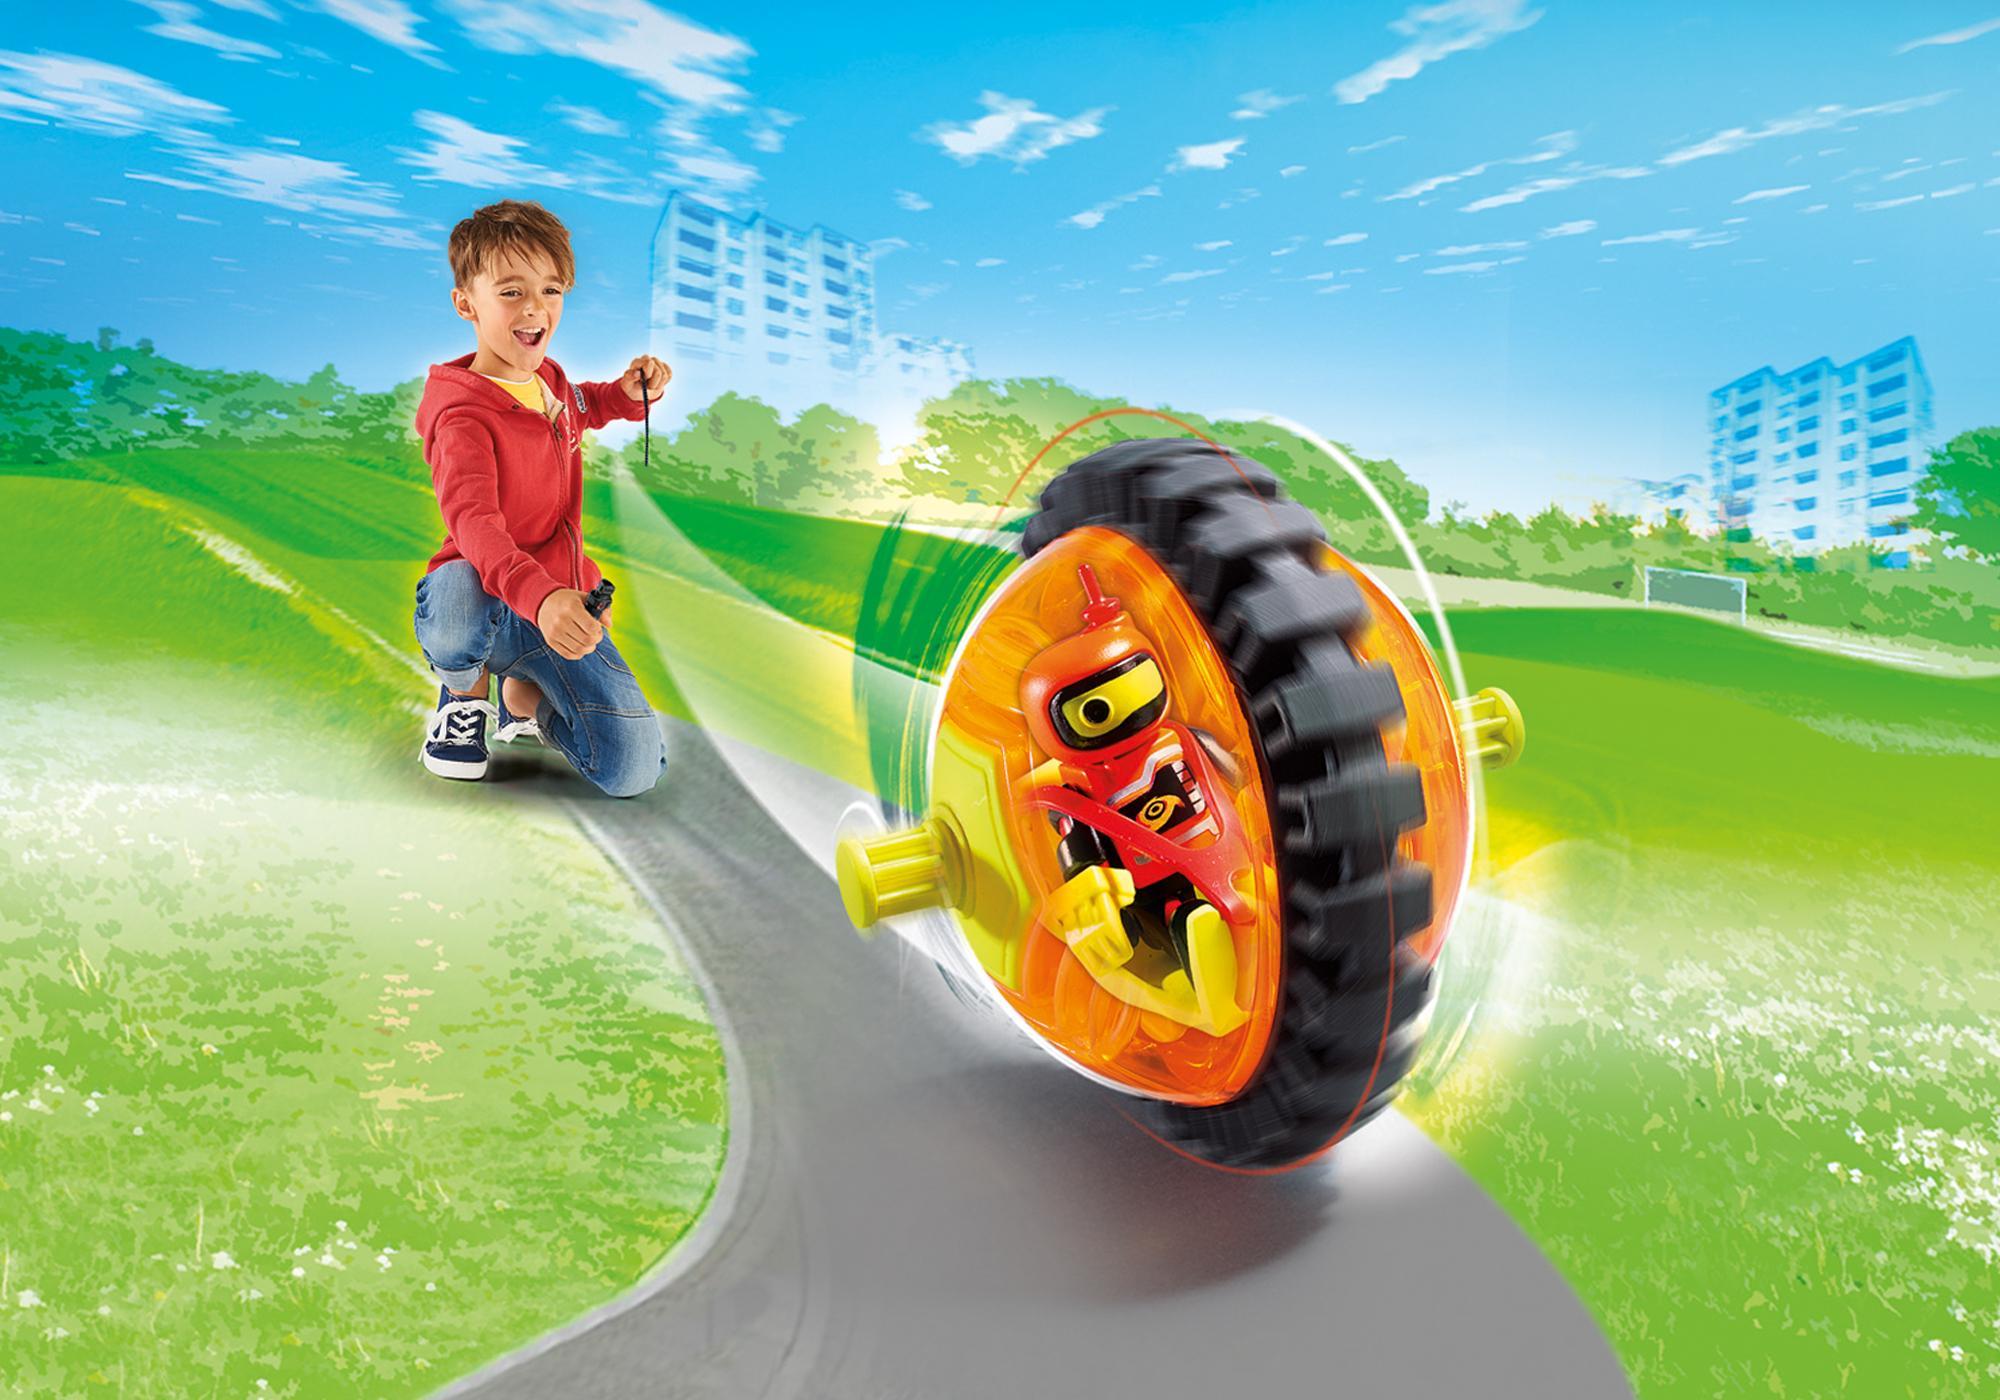 9203_product_detail/Orange Roller Racer